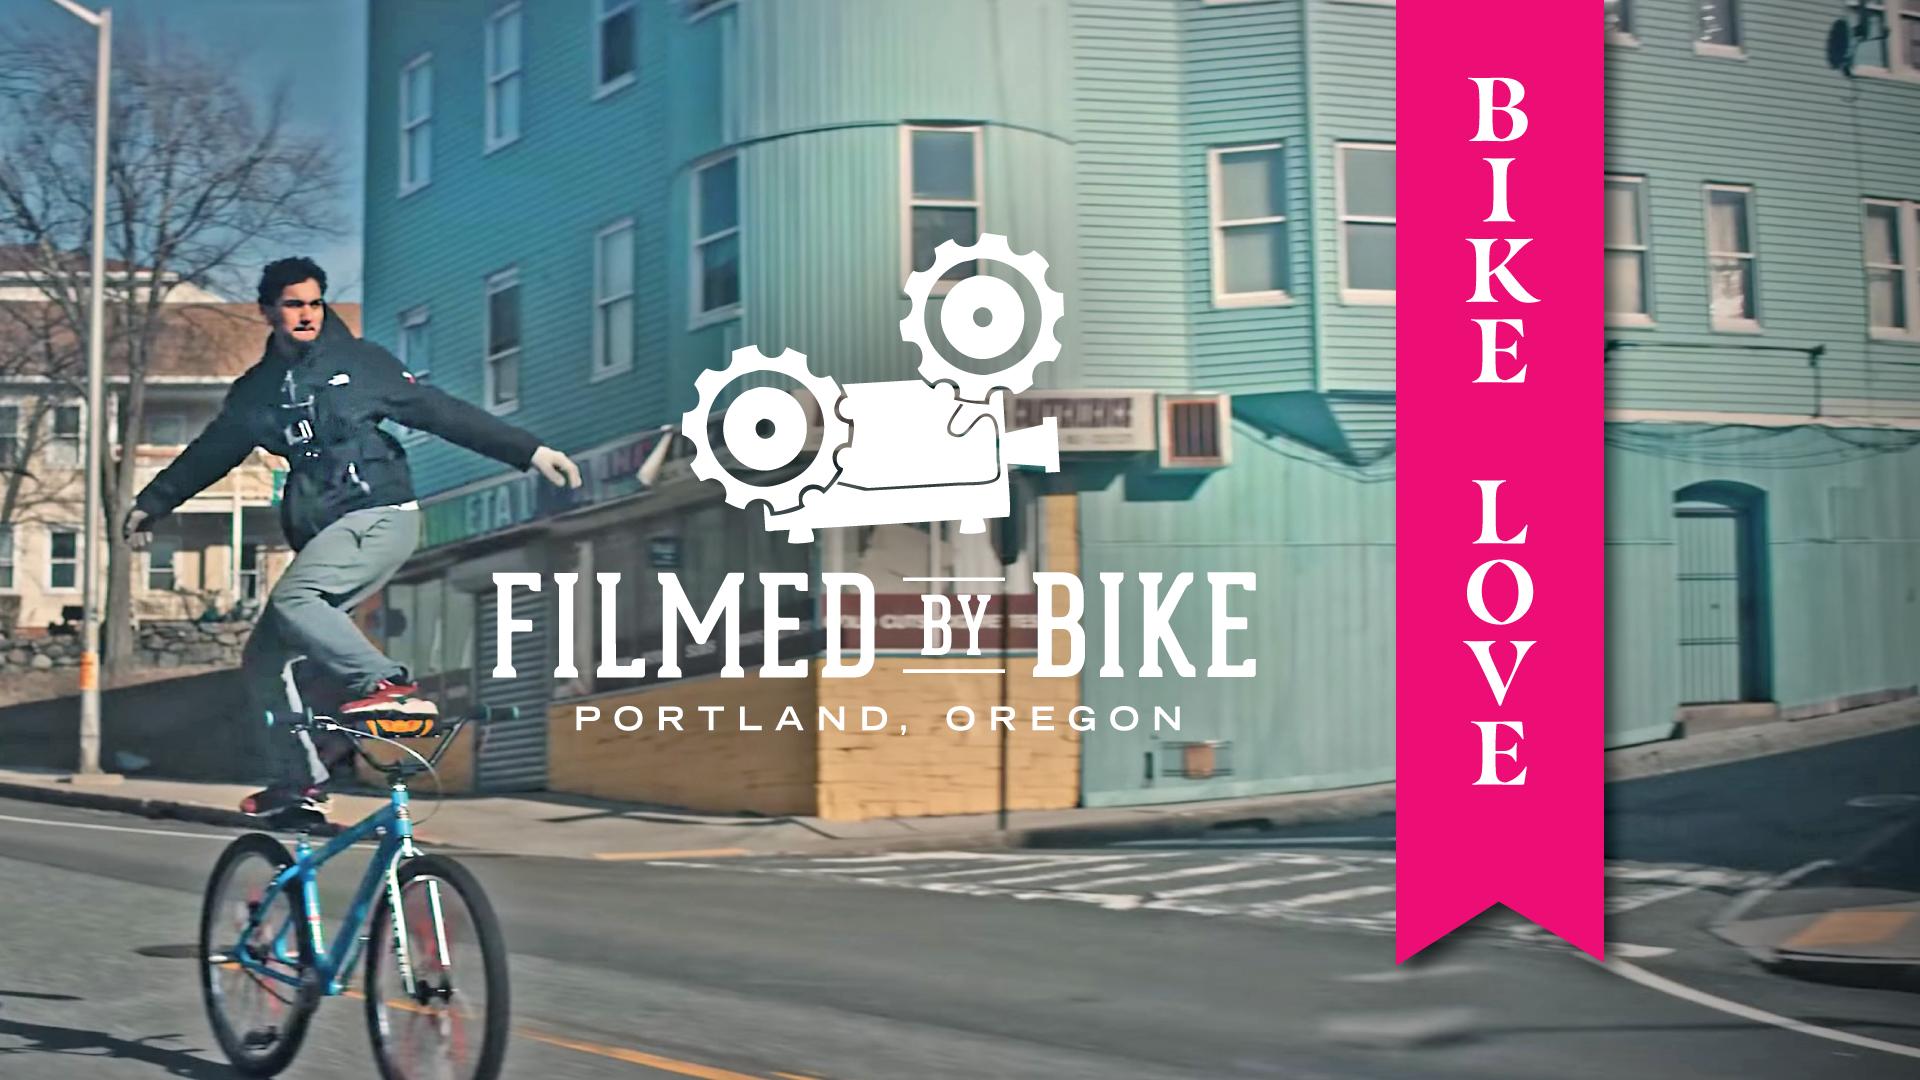 Filmed By Bike: Bike Love